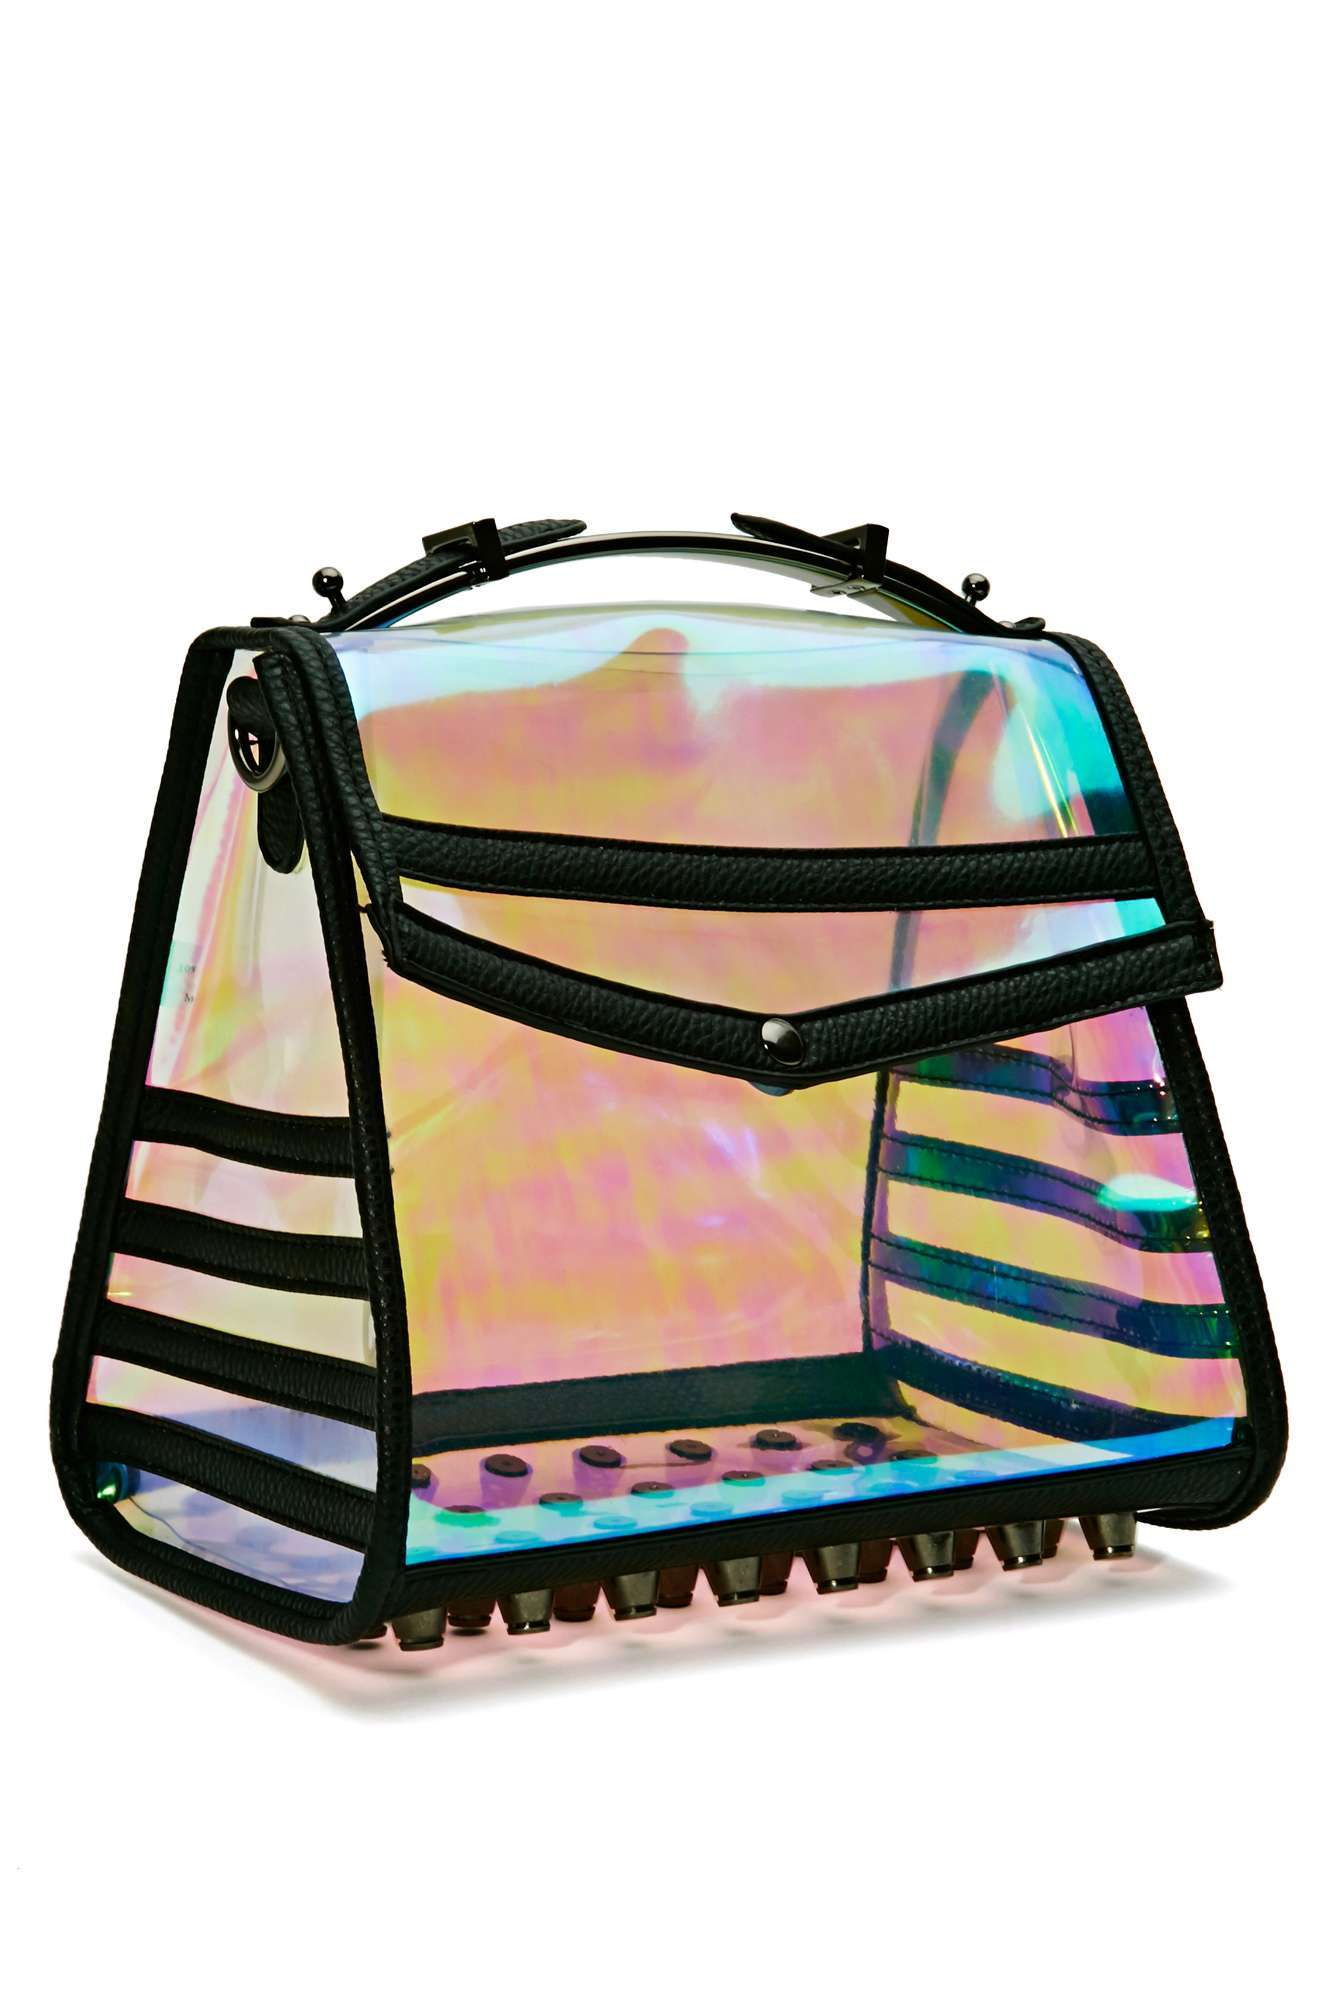 Holo At Me Bag